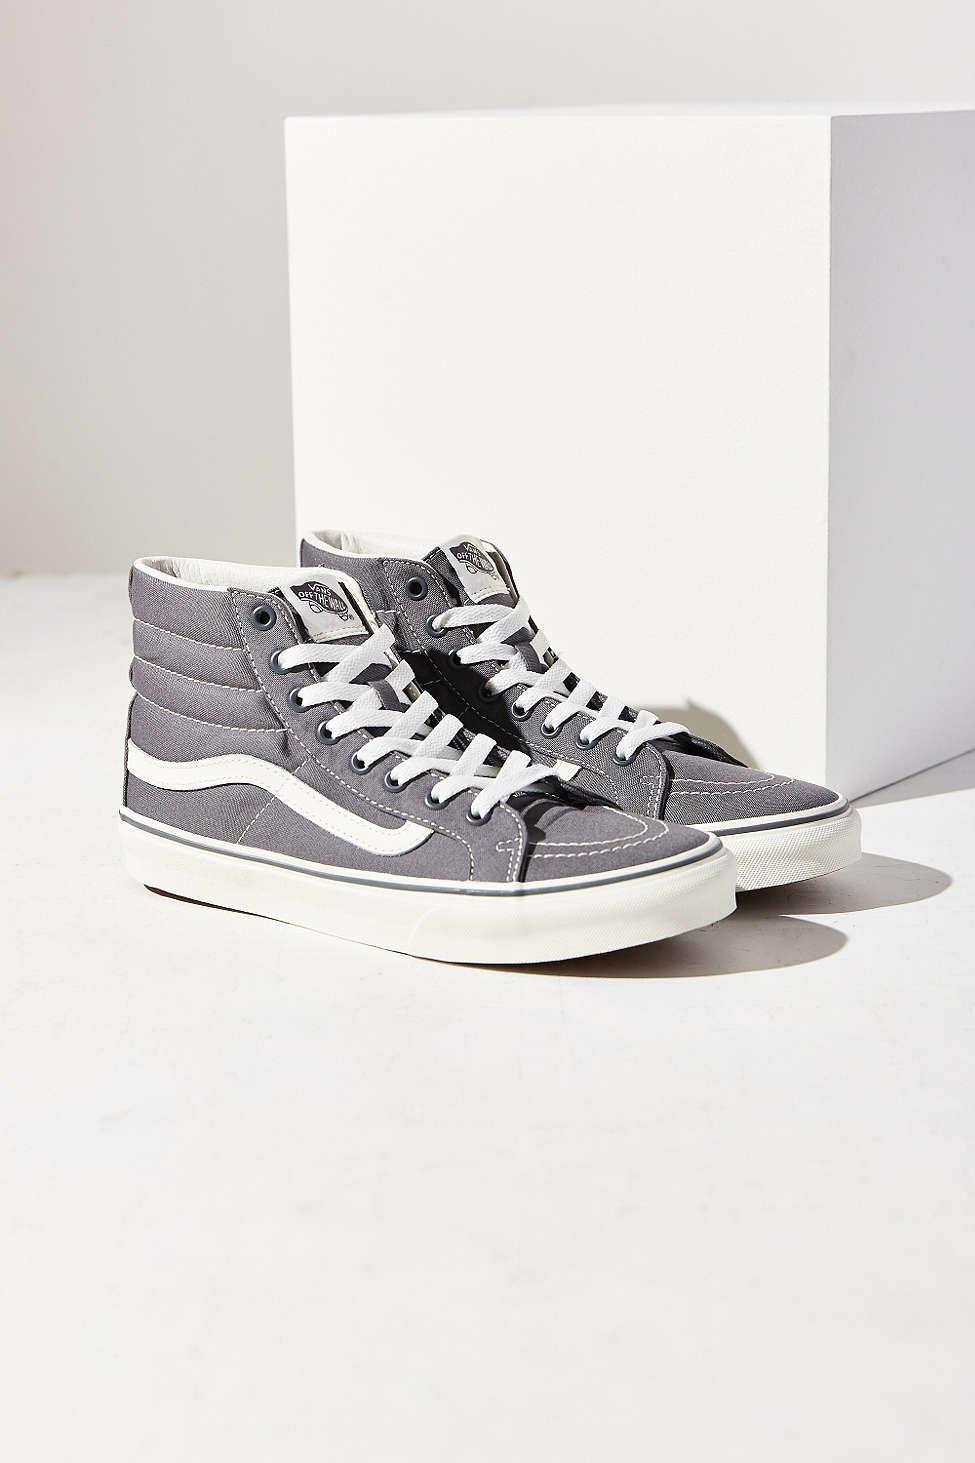 vans grey slim sk8 hi sneaker in gray lyst. Black Bedroom Furniture Sets. Home Design Ideas